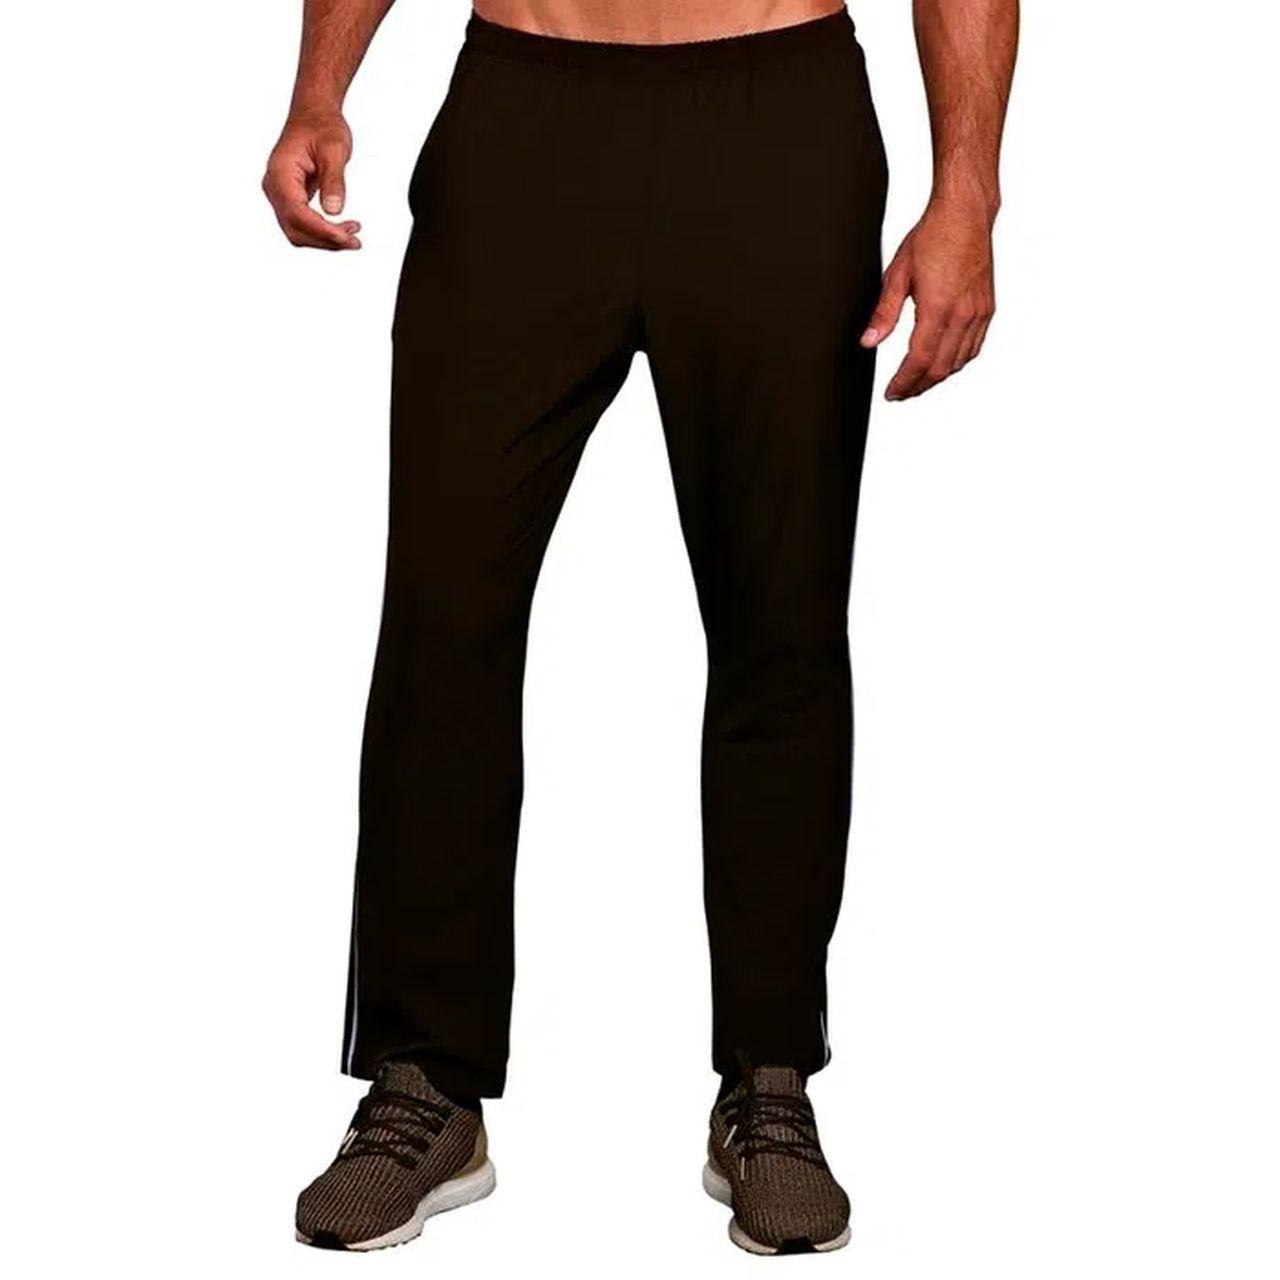 Calça tactel masculina sem punho esportiva academia bolso